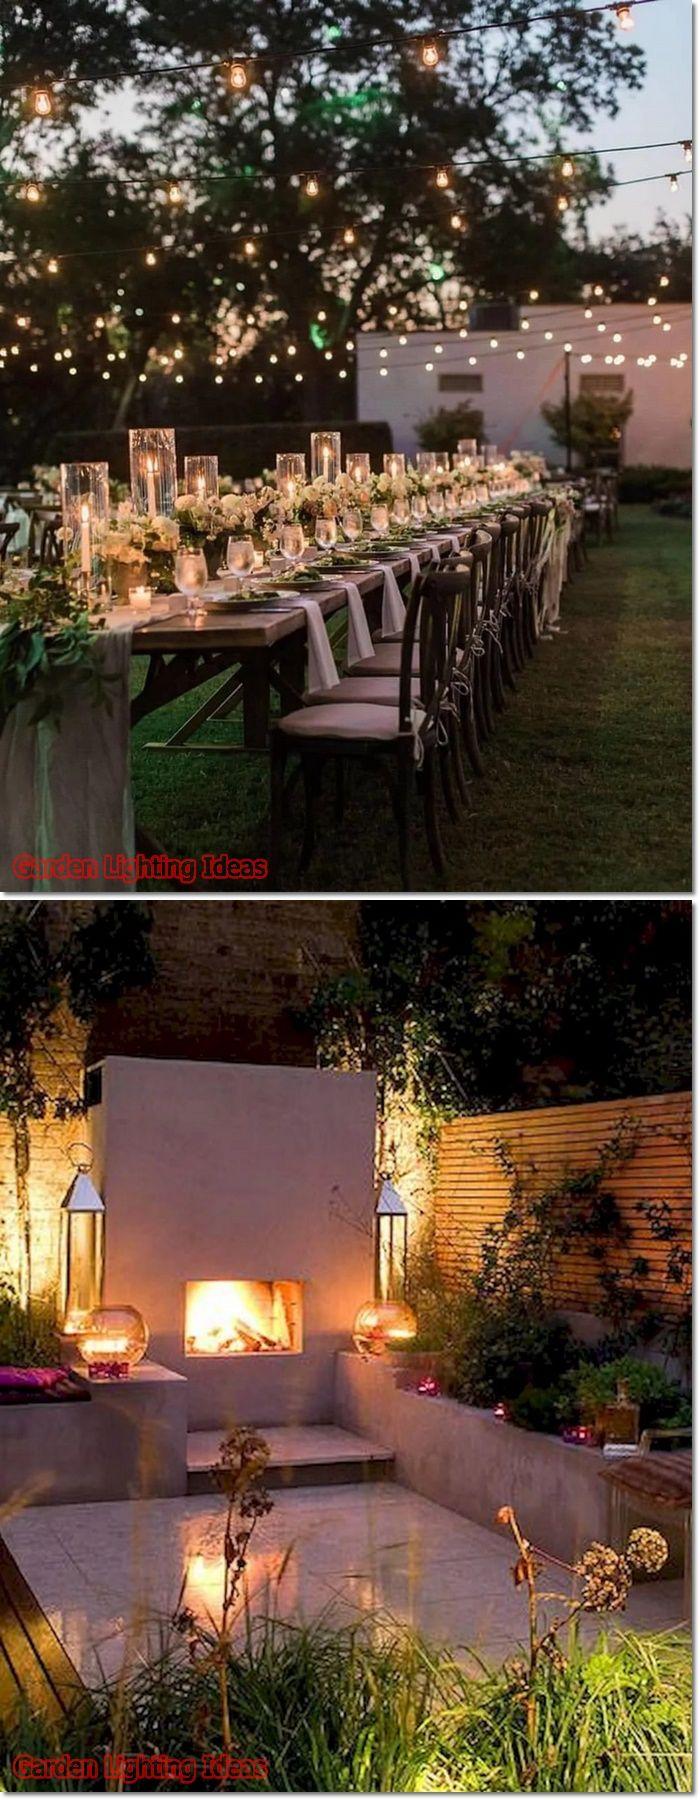 Garden Lighting Ideas 2020 How can I make my yard look